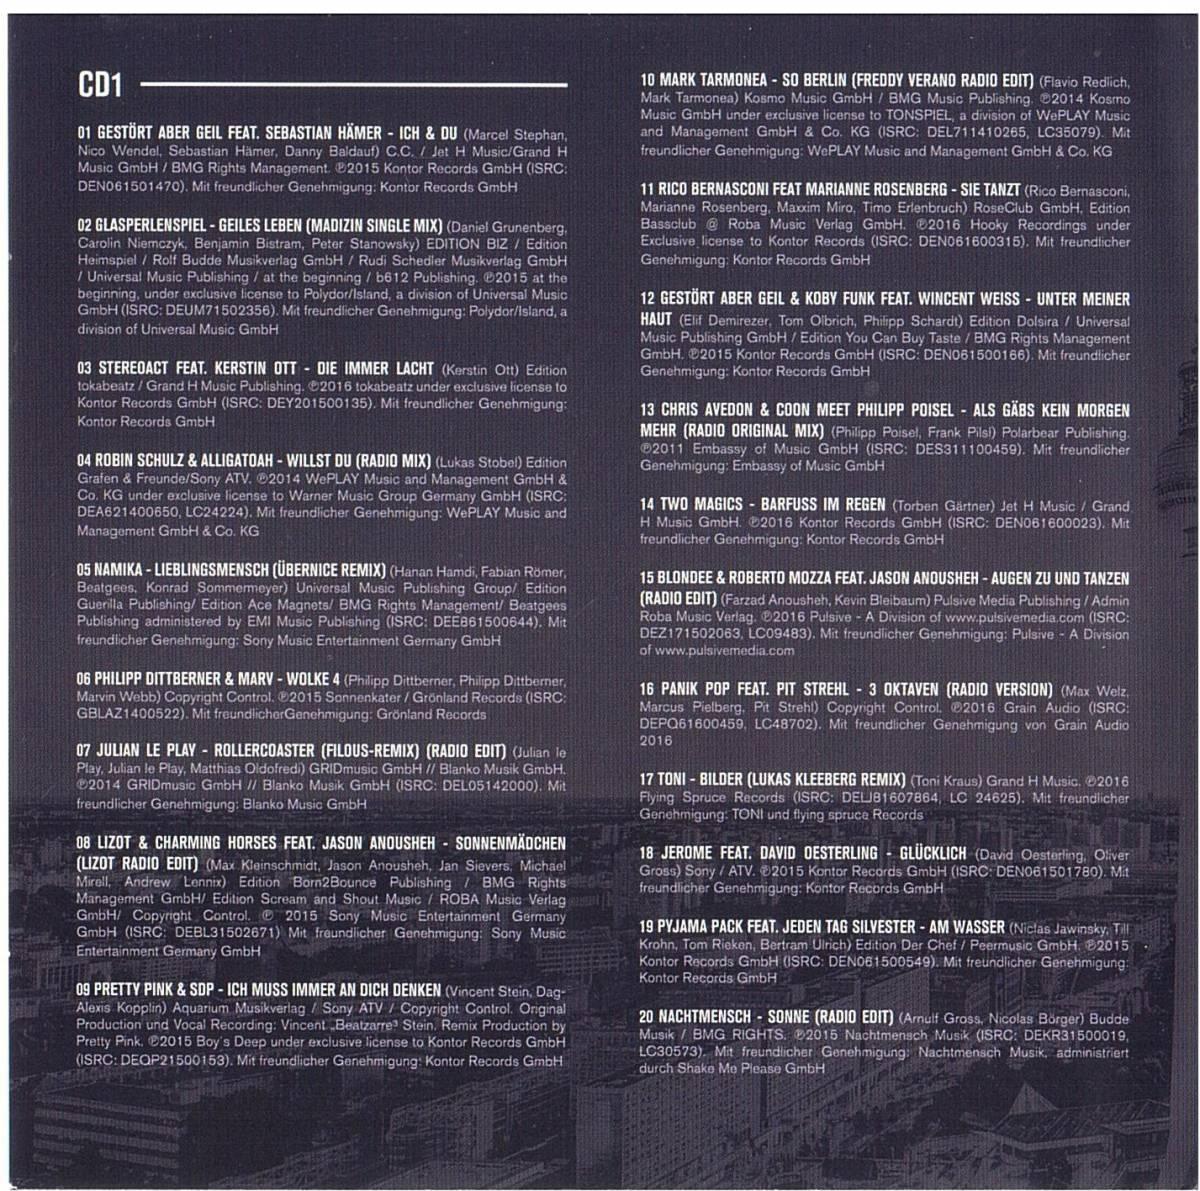 DEUTSCHHOUSE - 2-CD (2016)